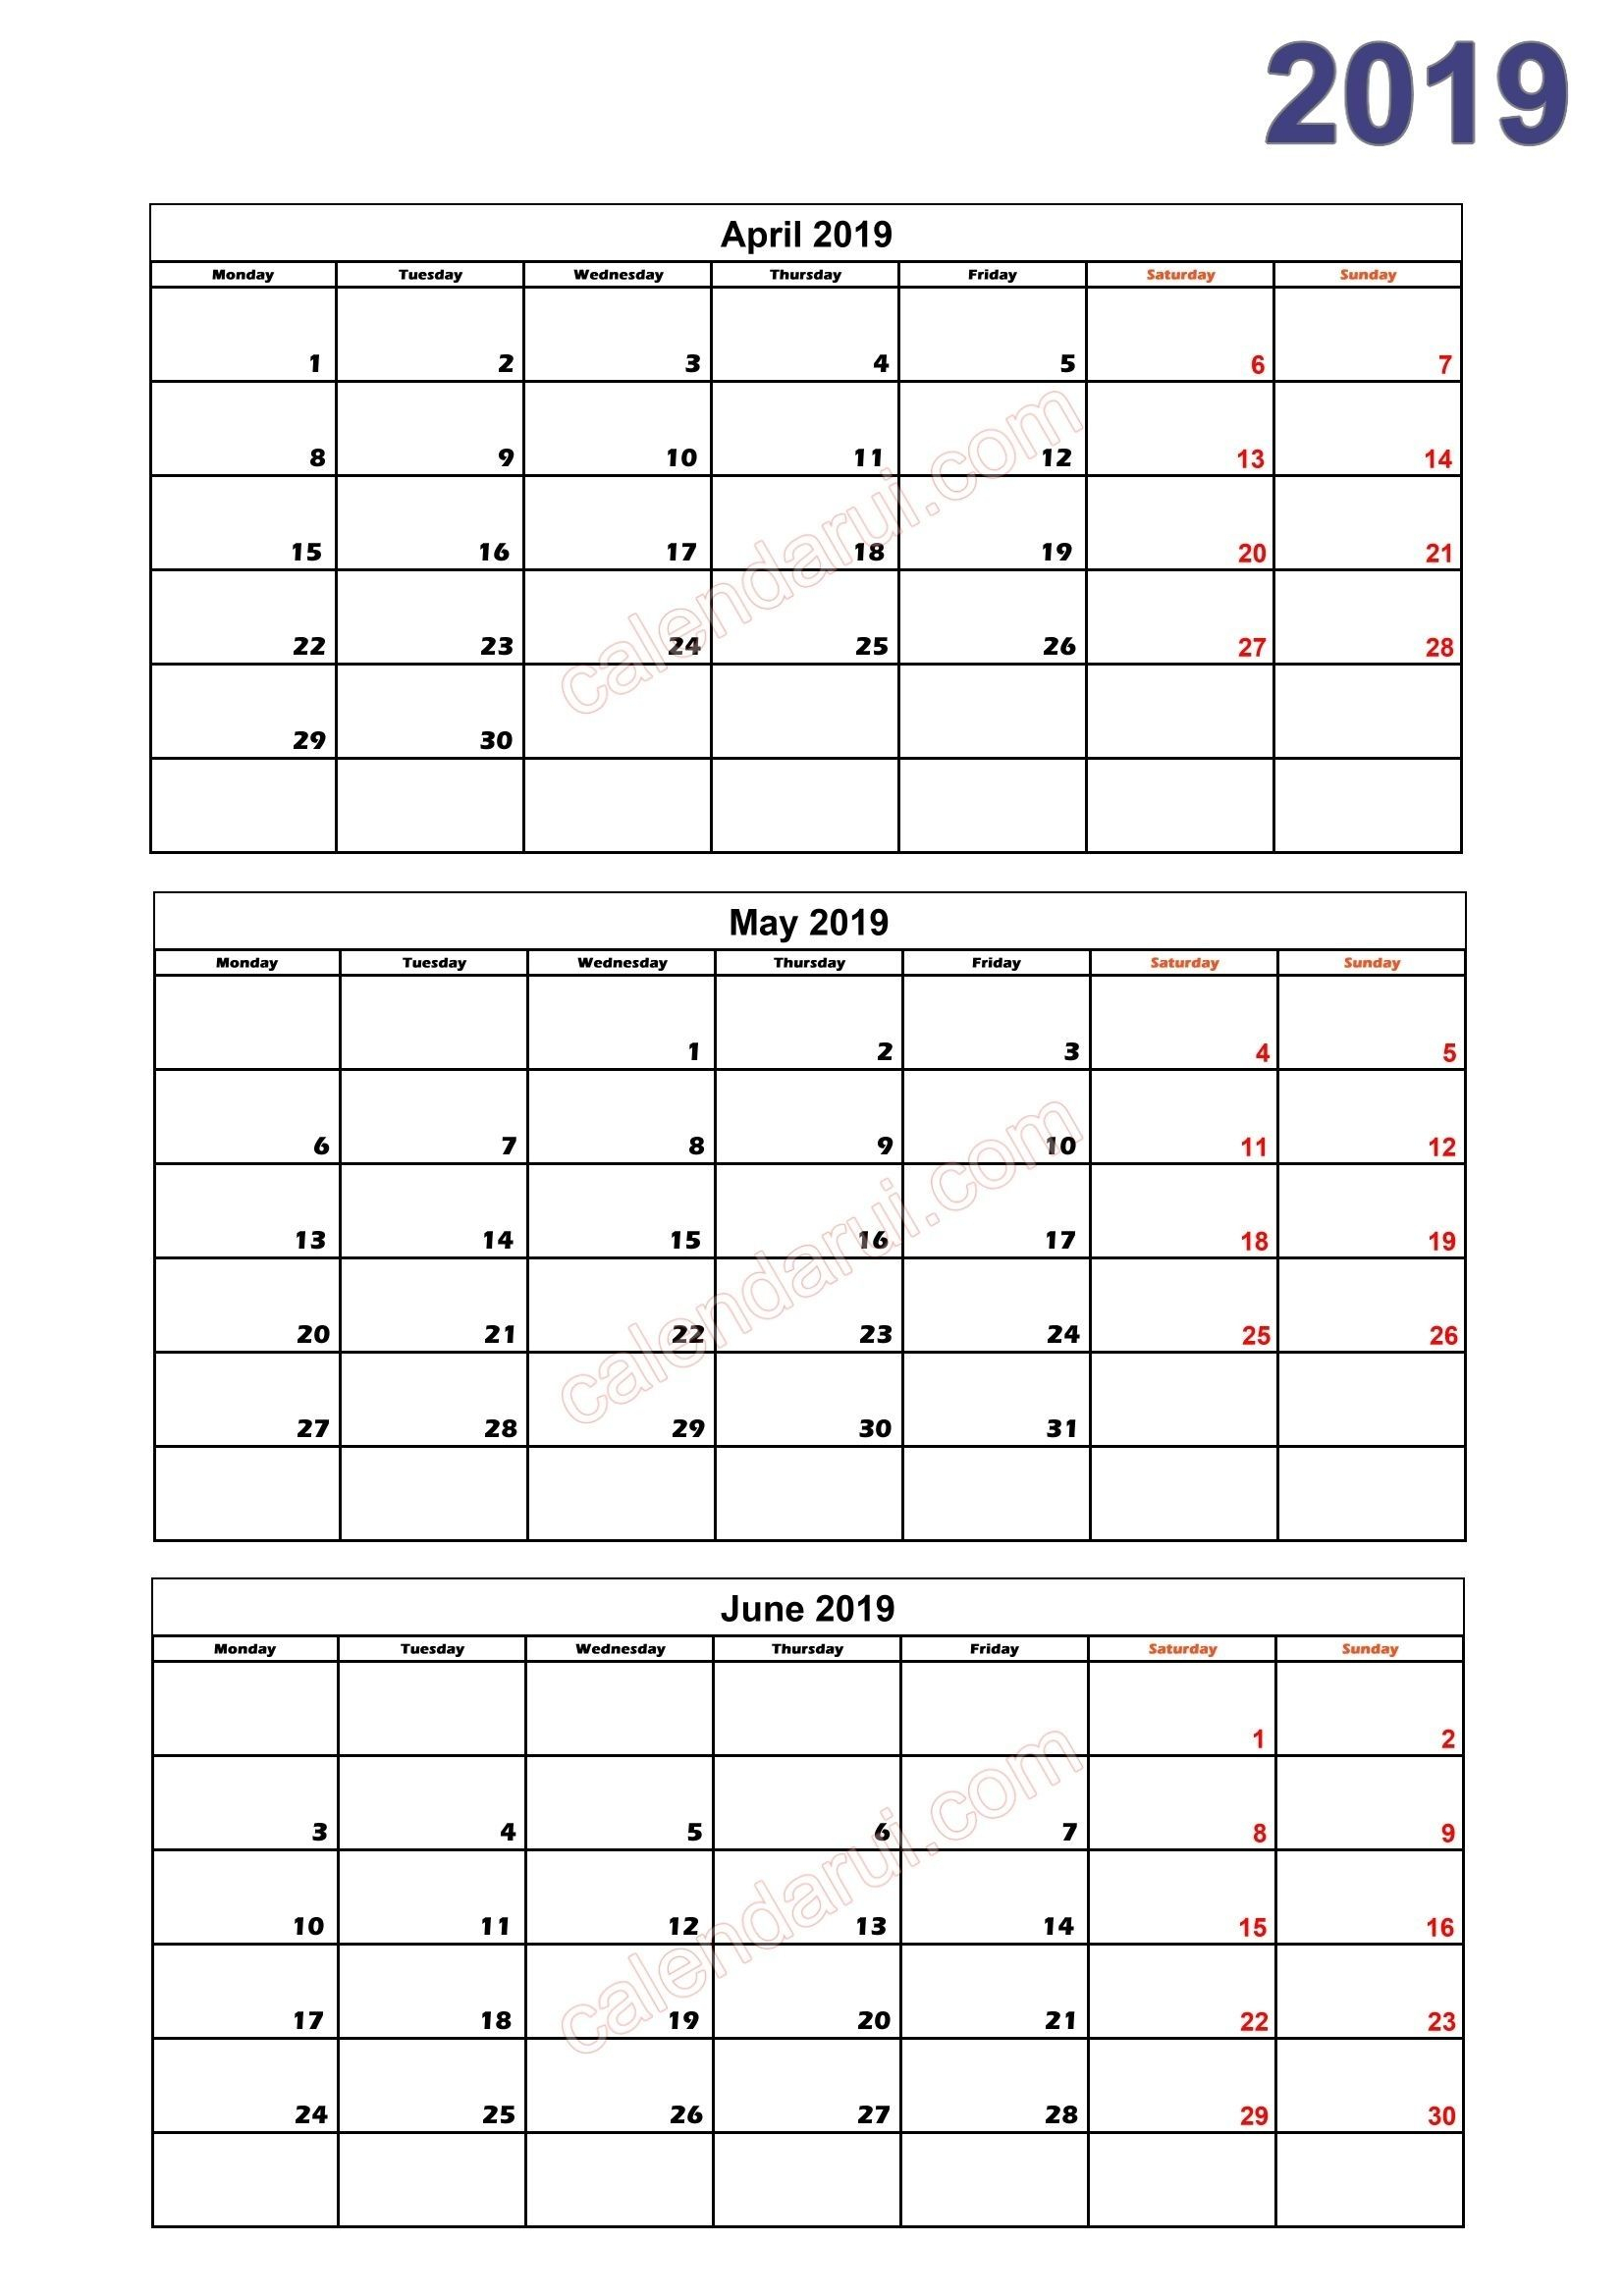 Free Printable Calendar Quarterly In 2020 | Calendar 2019